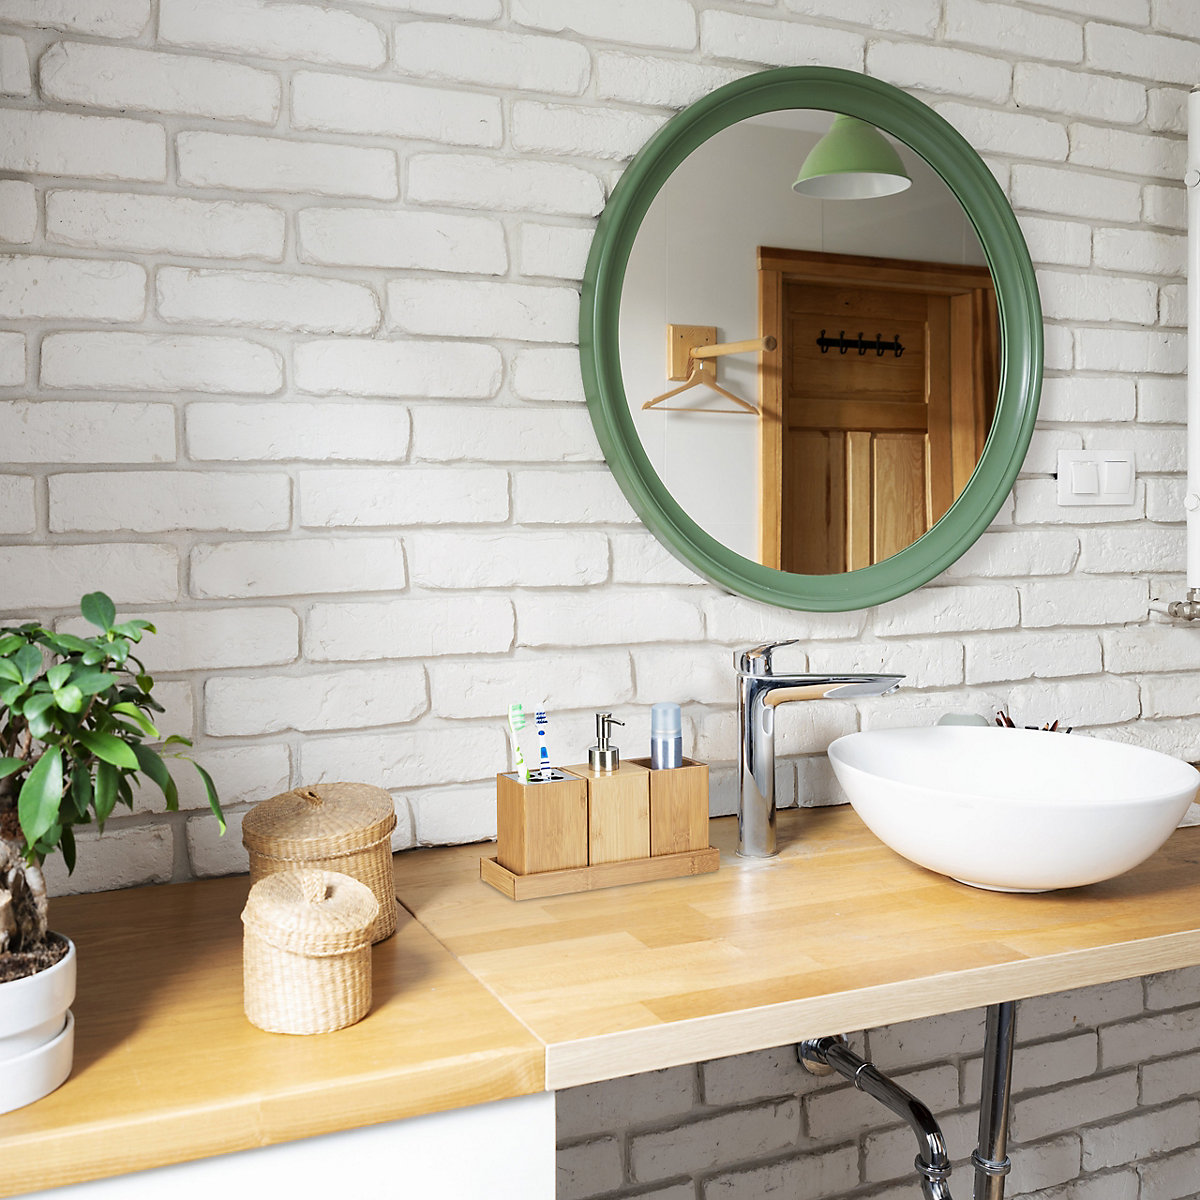 4 tlg bambus bad accessoires set beige yomonda. Black Bedroom Furniture Sets. Home Design Ideas